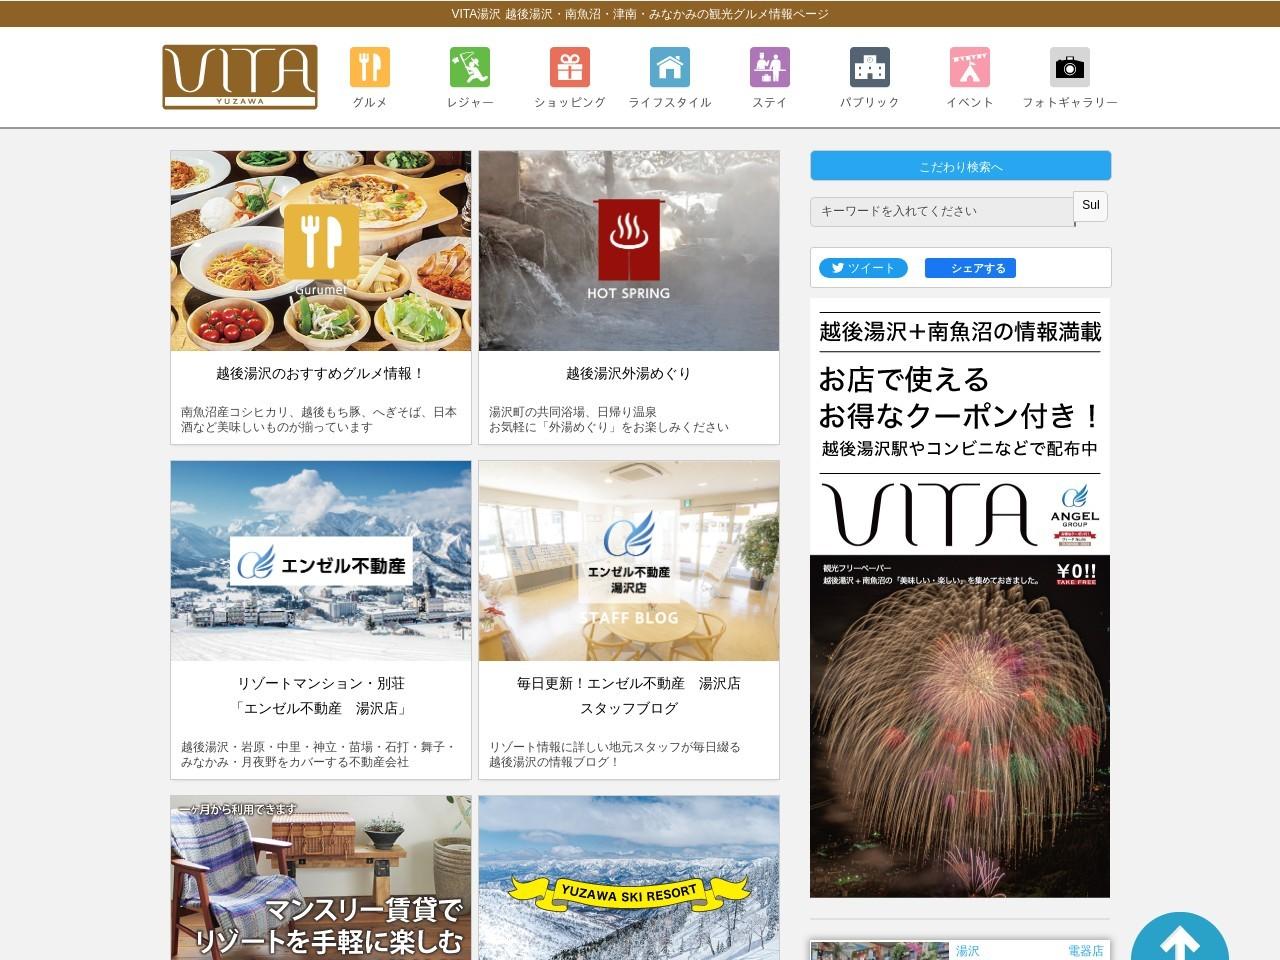 VITA湯沢 越後湯沢・南魚沼・津南・みなかみの観光グルメ情報サイト